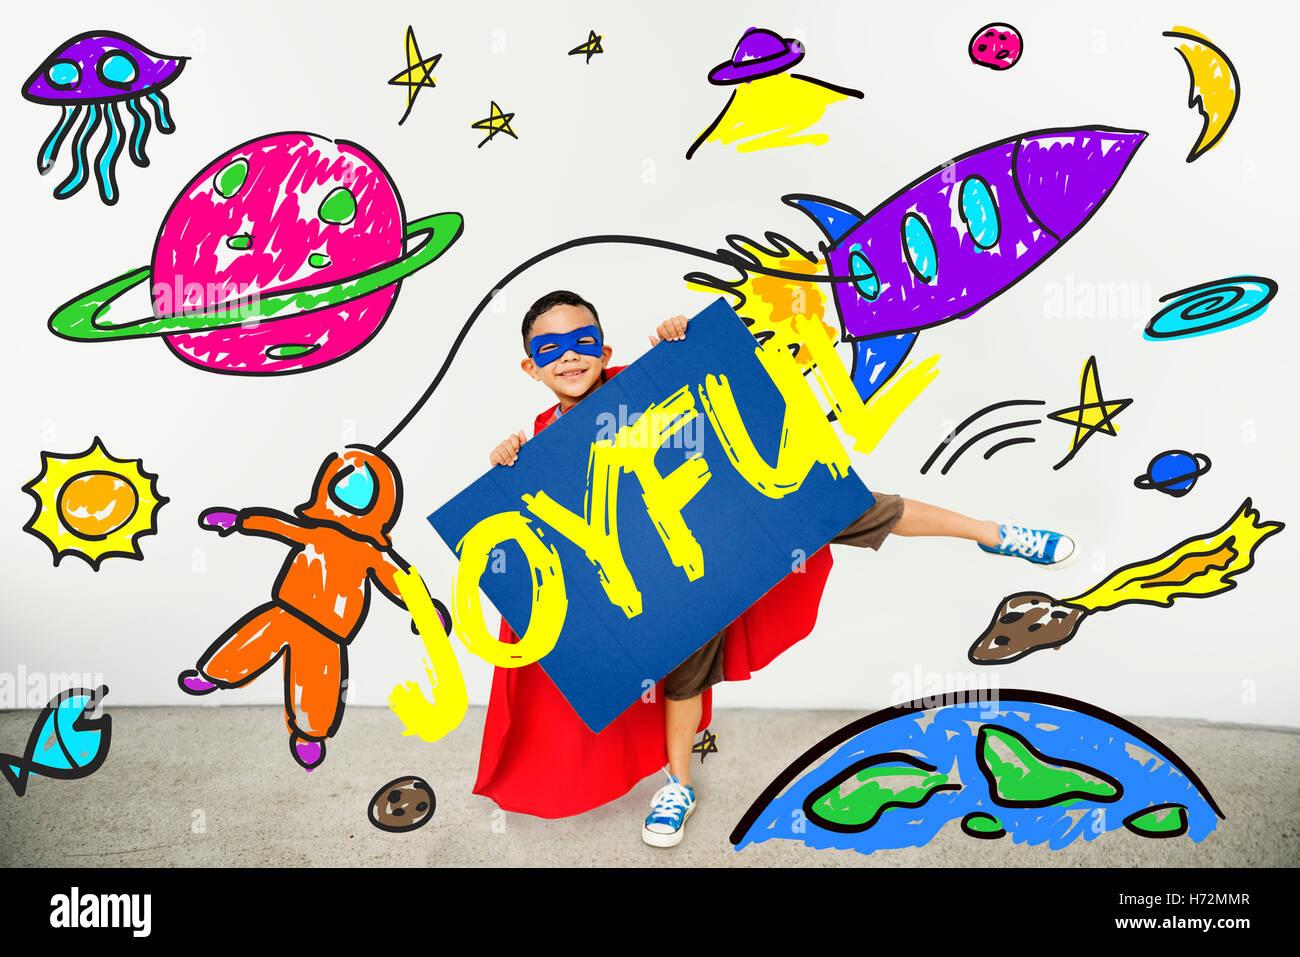 Kids Imagination Space Rocket Joyful Graphic Concept Stock